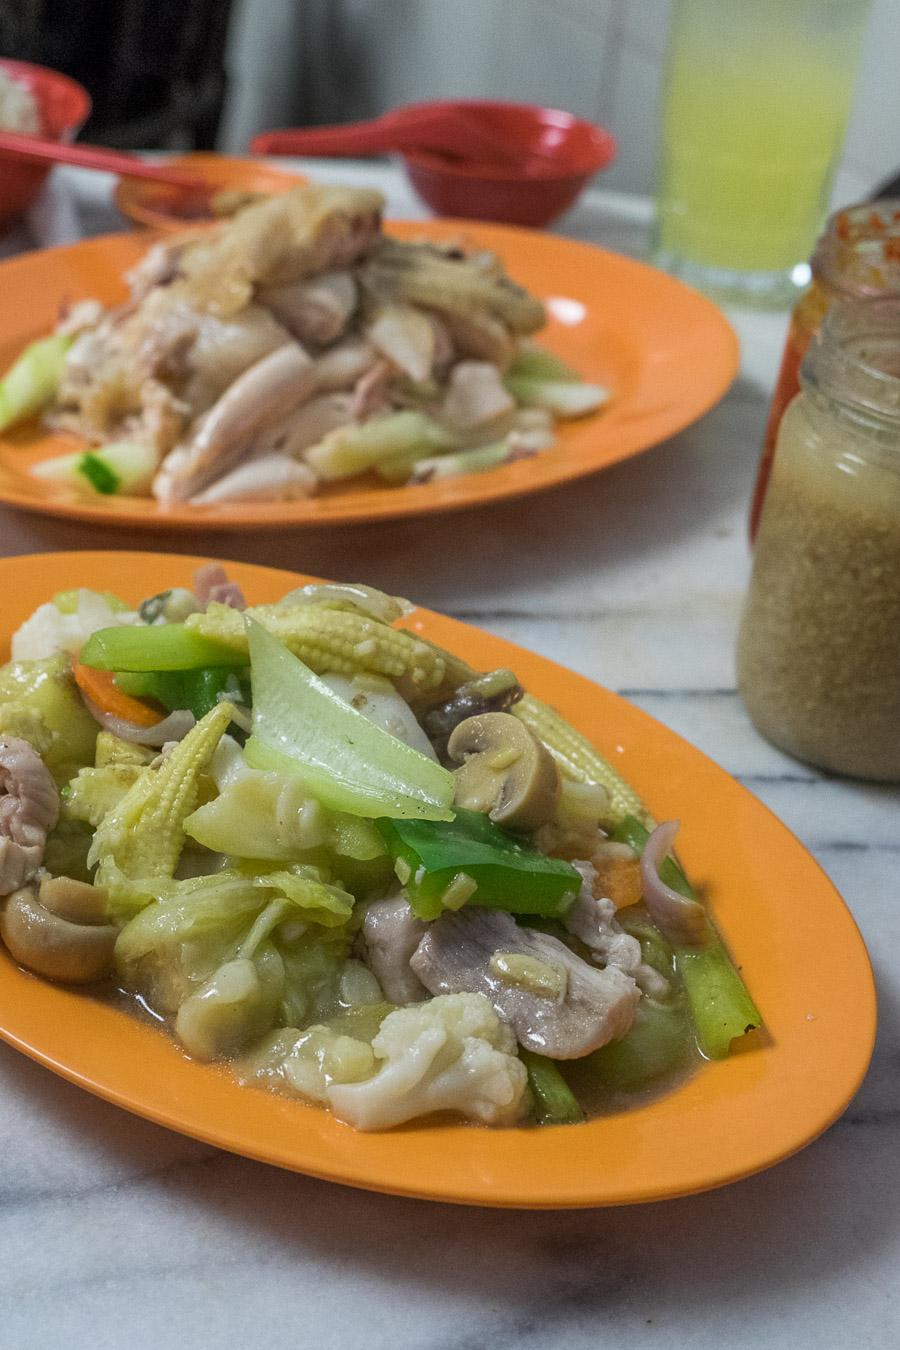 Mixed chop suey